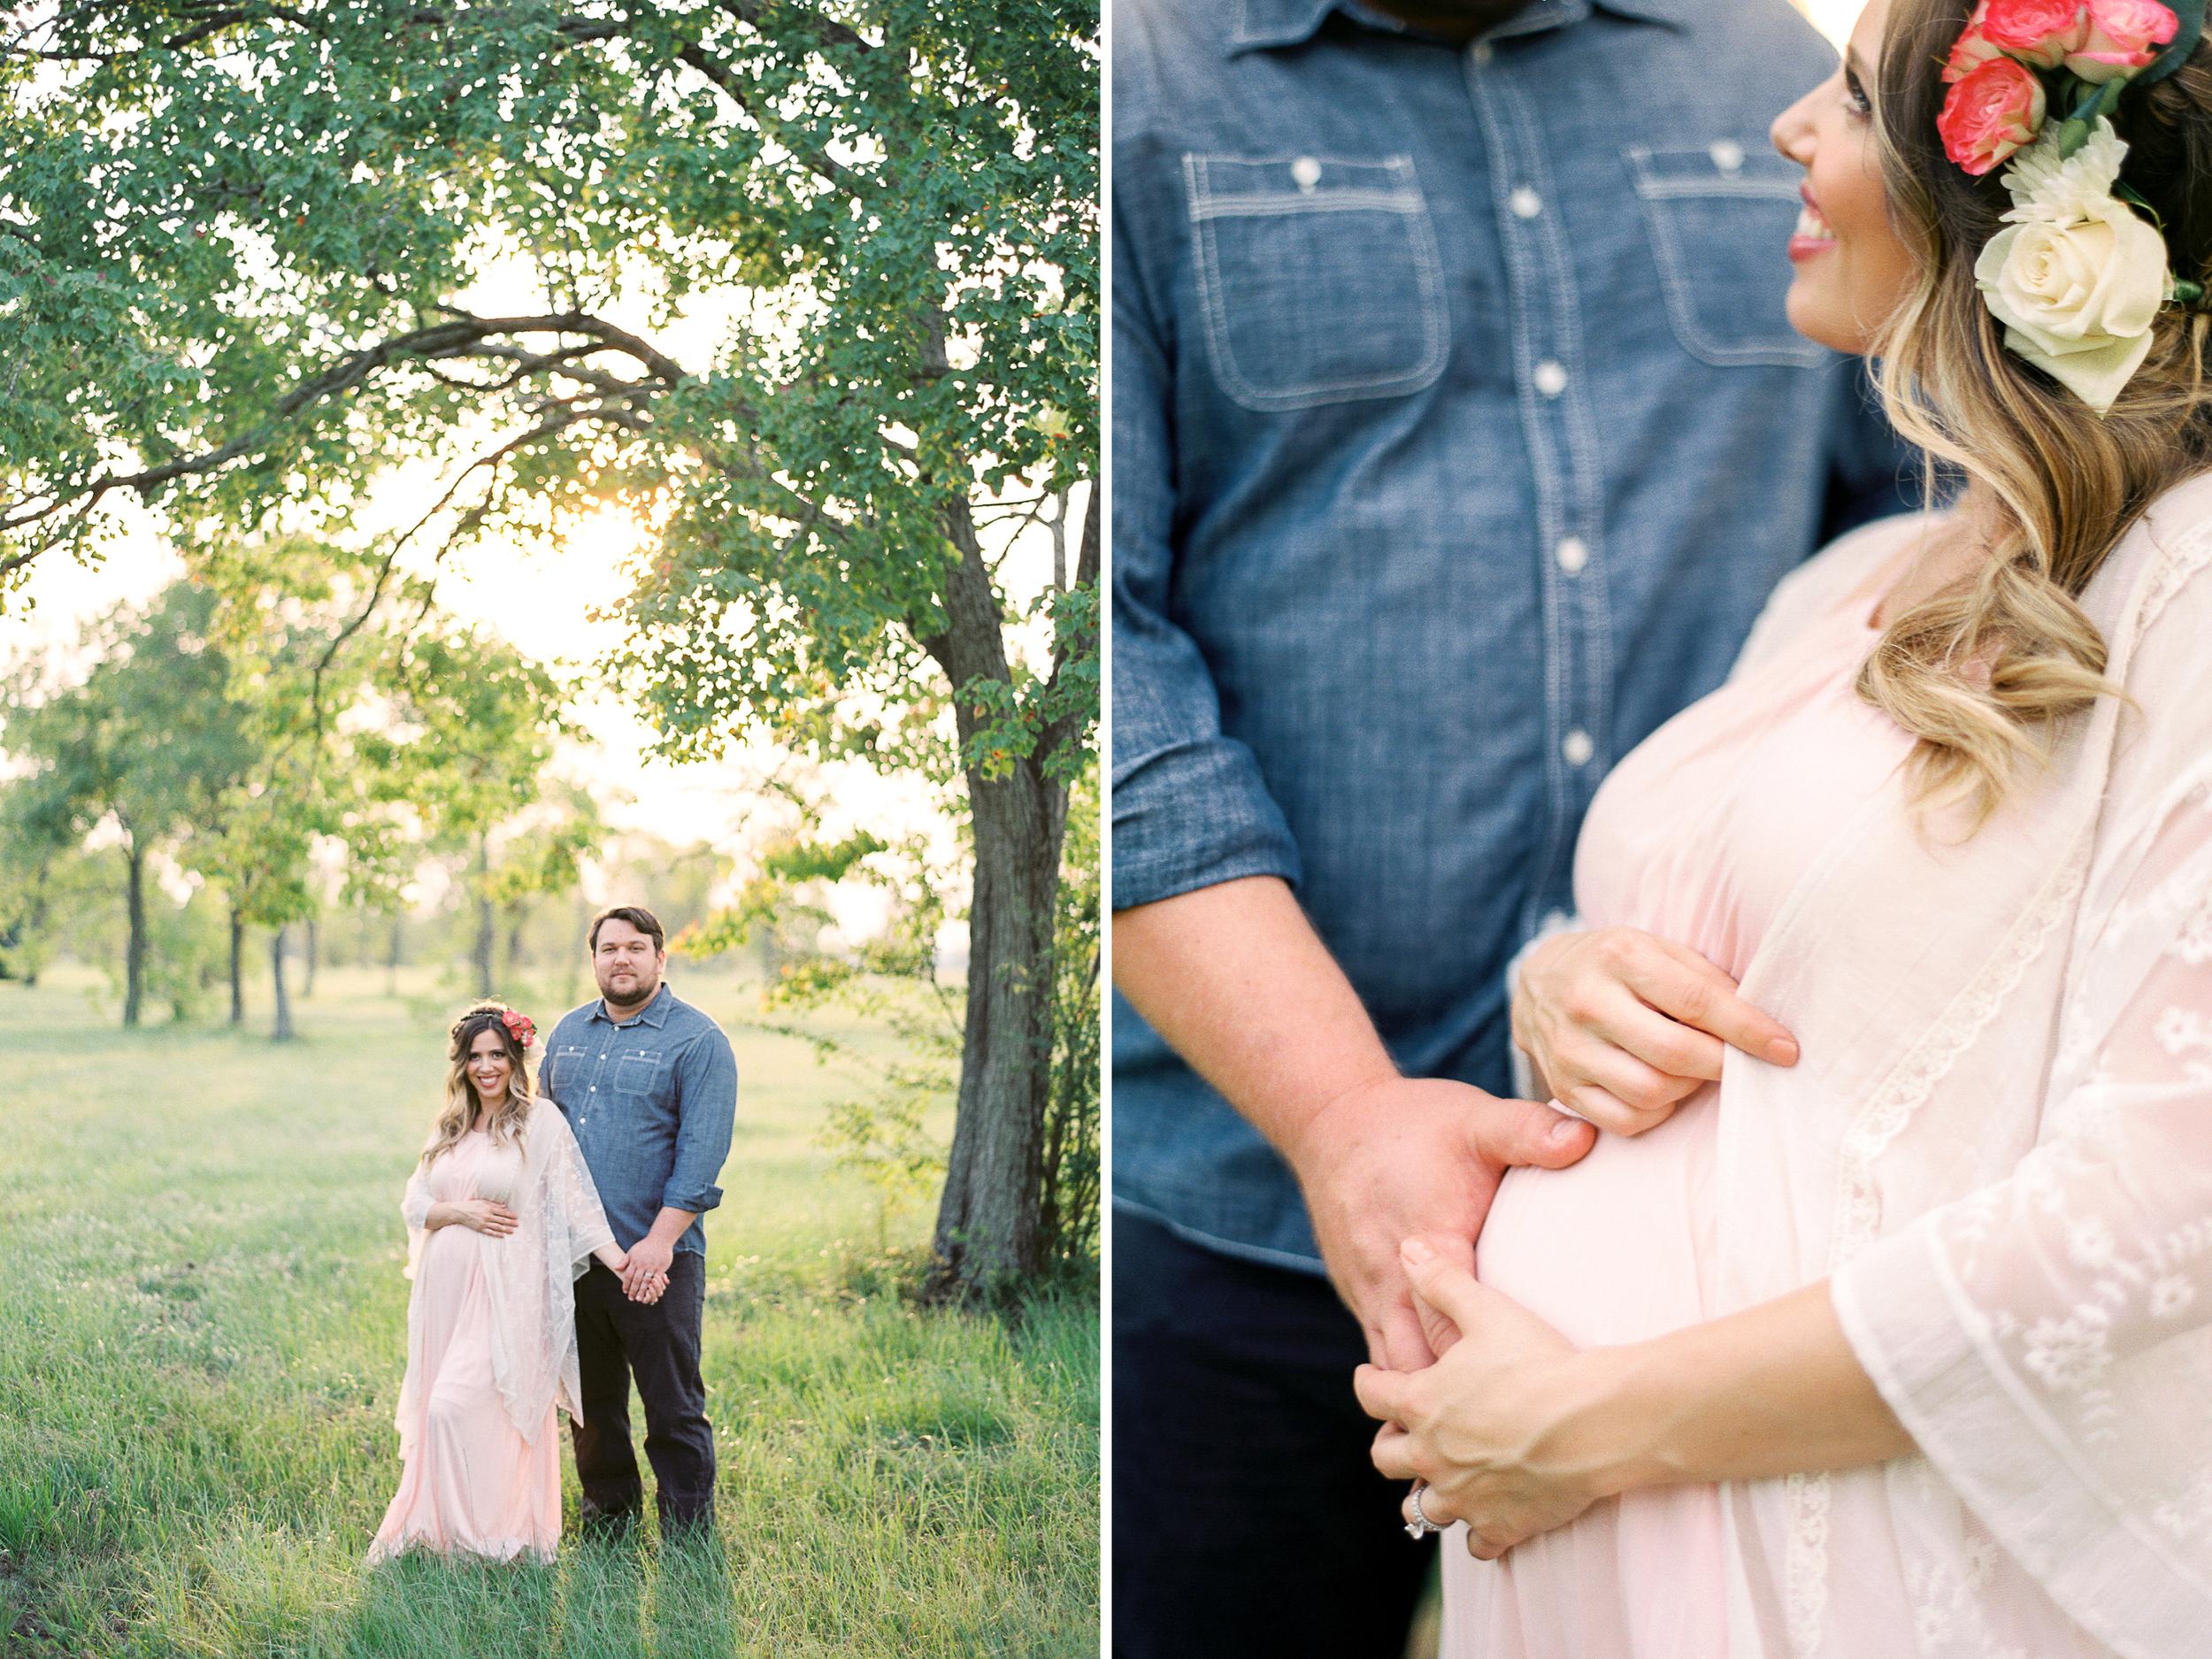 Dana-Fernandez-Photography-Houston-Maternity-Family-Portrait-Photographer-Film-101.jpg